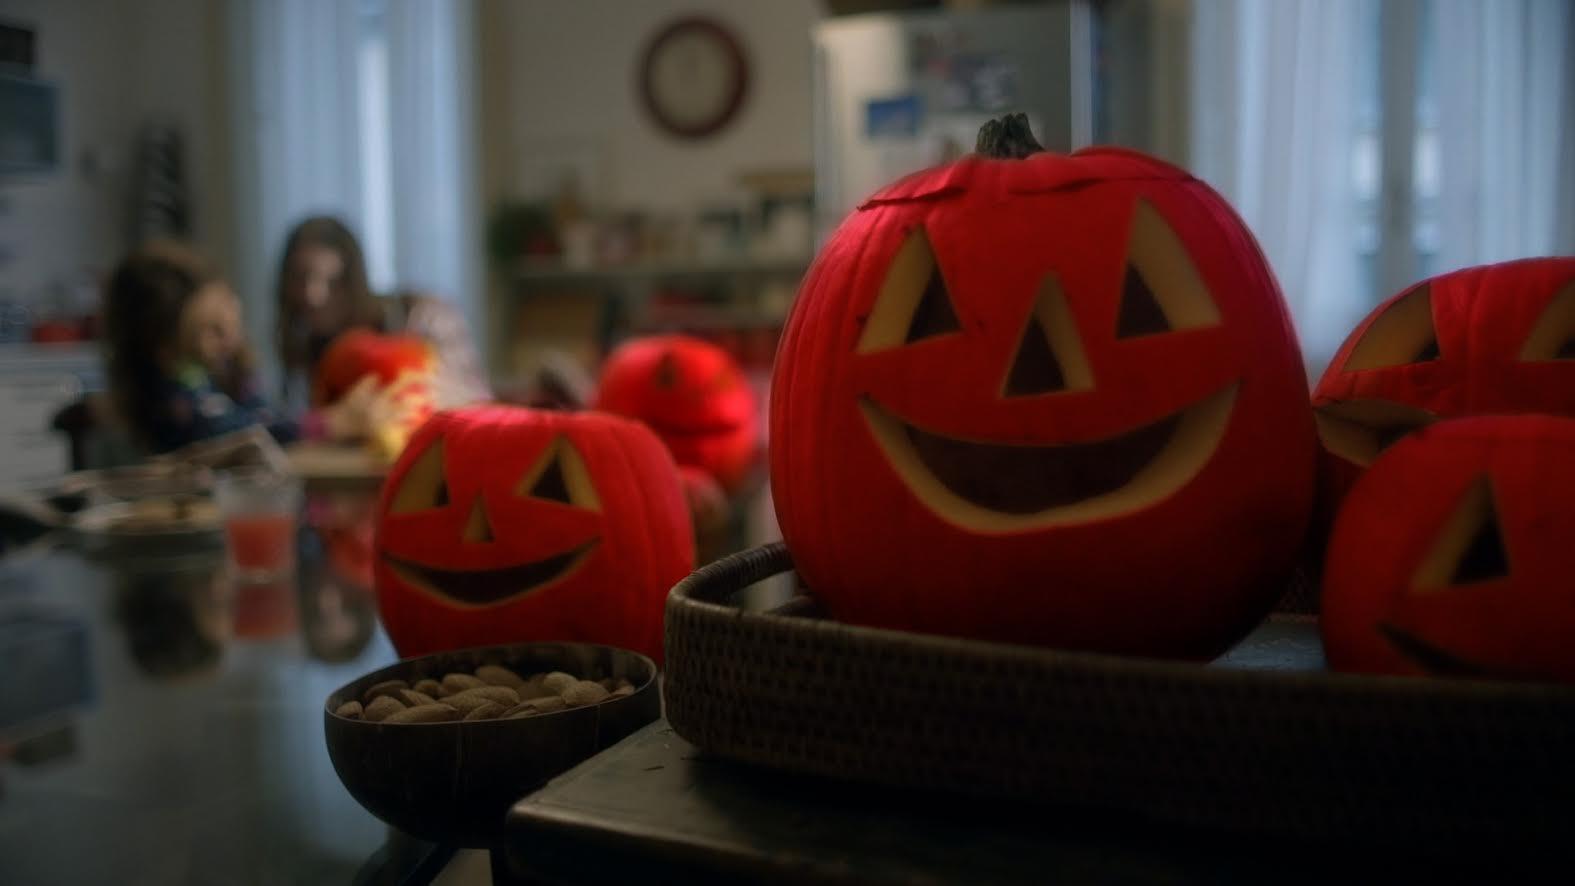 Vodafone regala per Halloween 4 GB di Internet a tutti i clienti